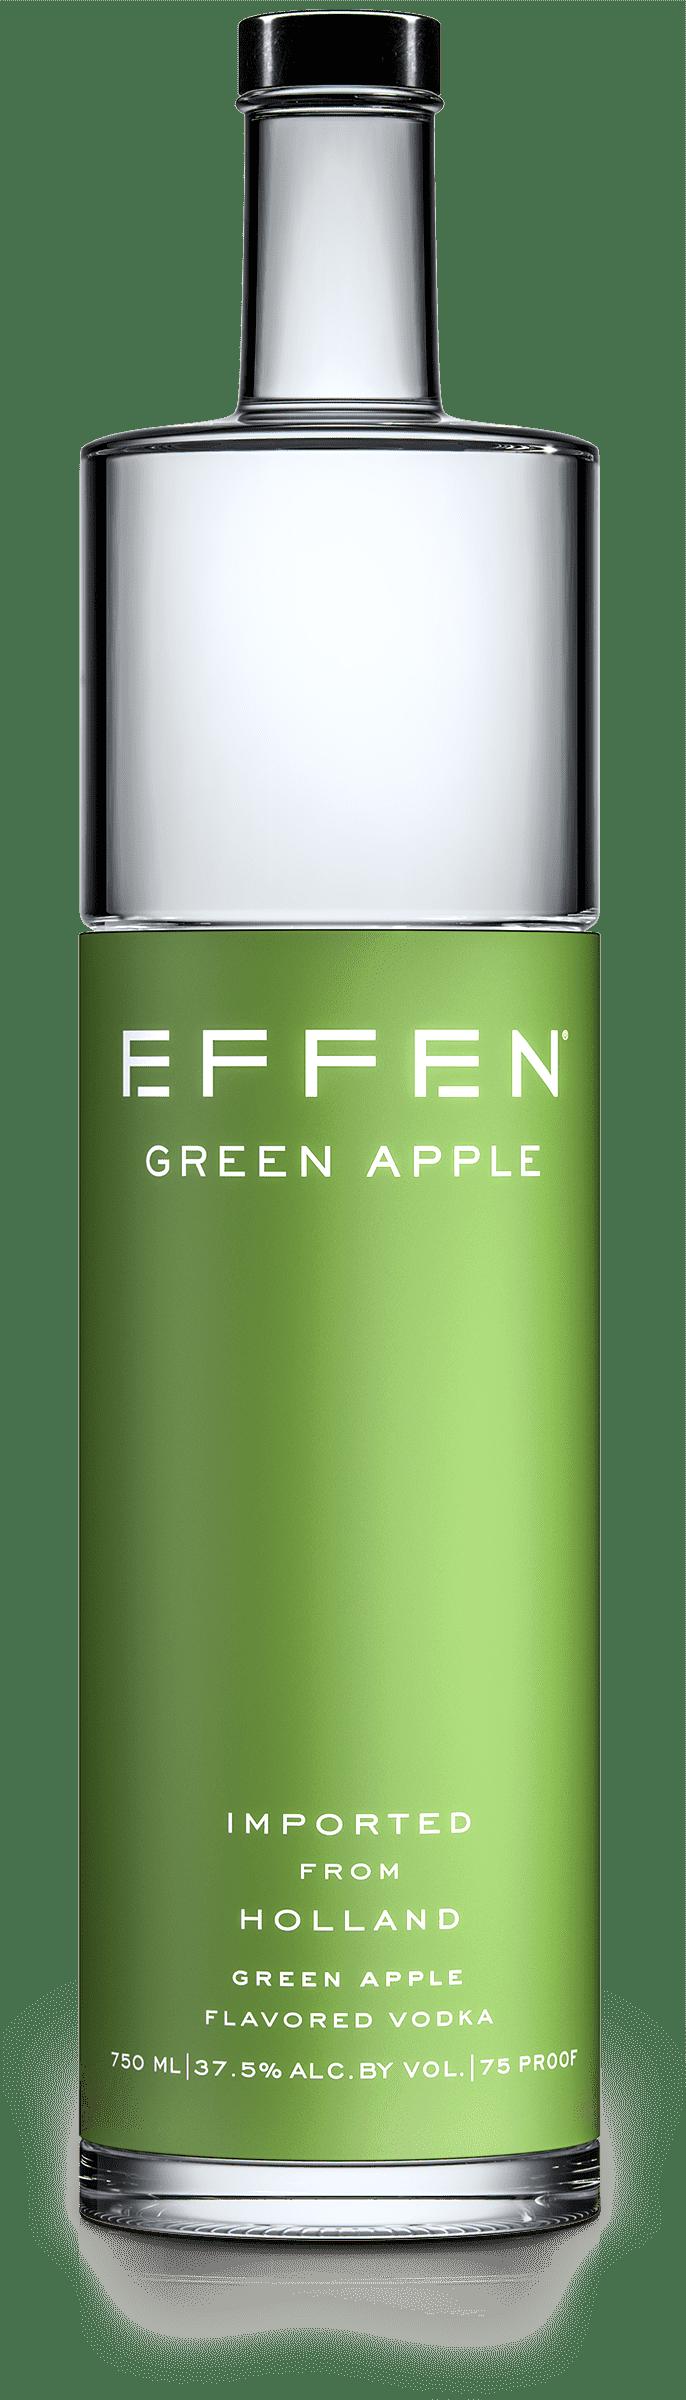 EFFEN Green Apple Vodka bottle shot